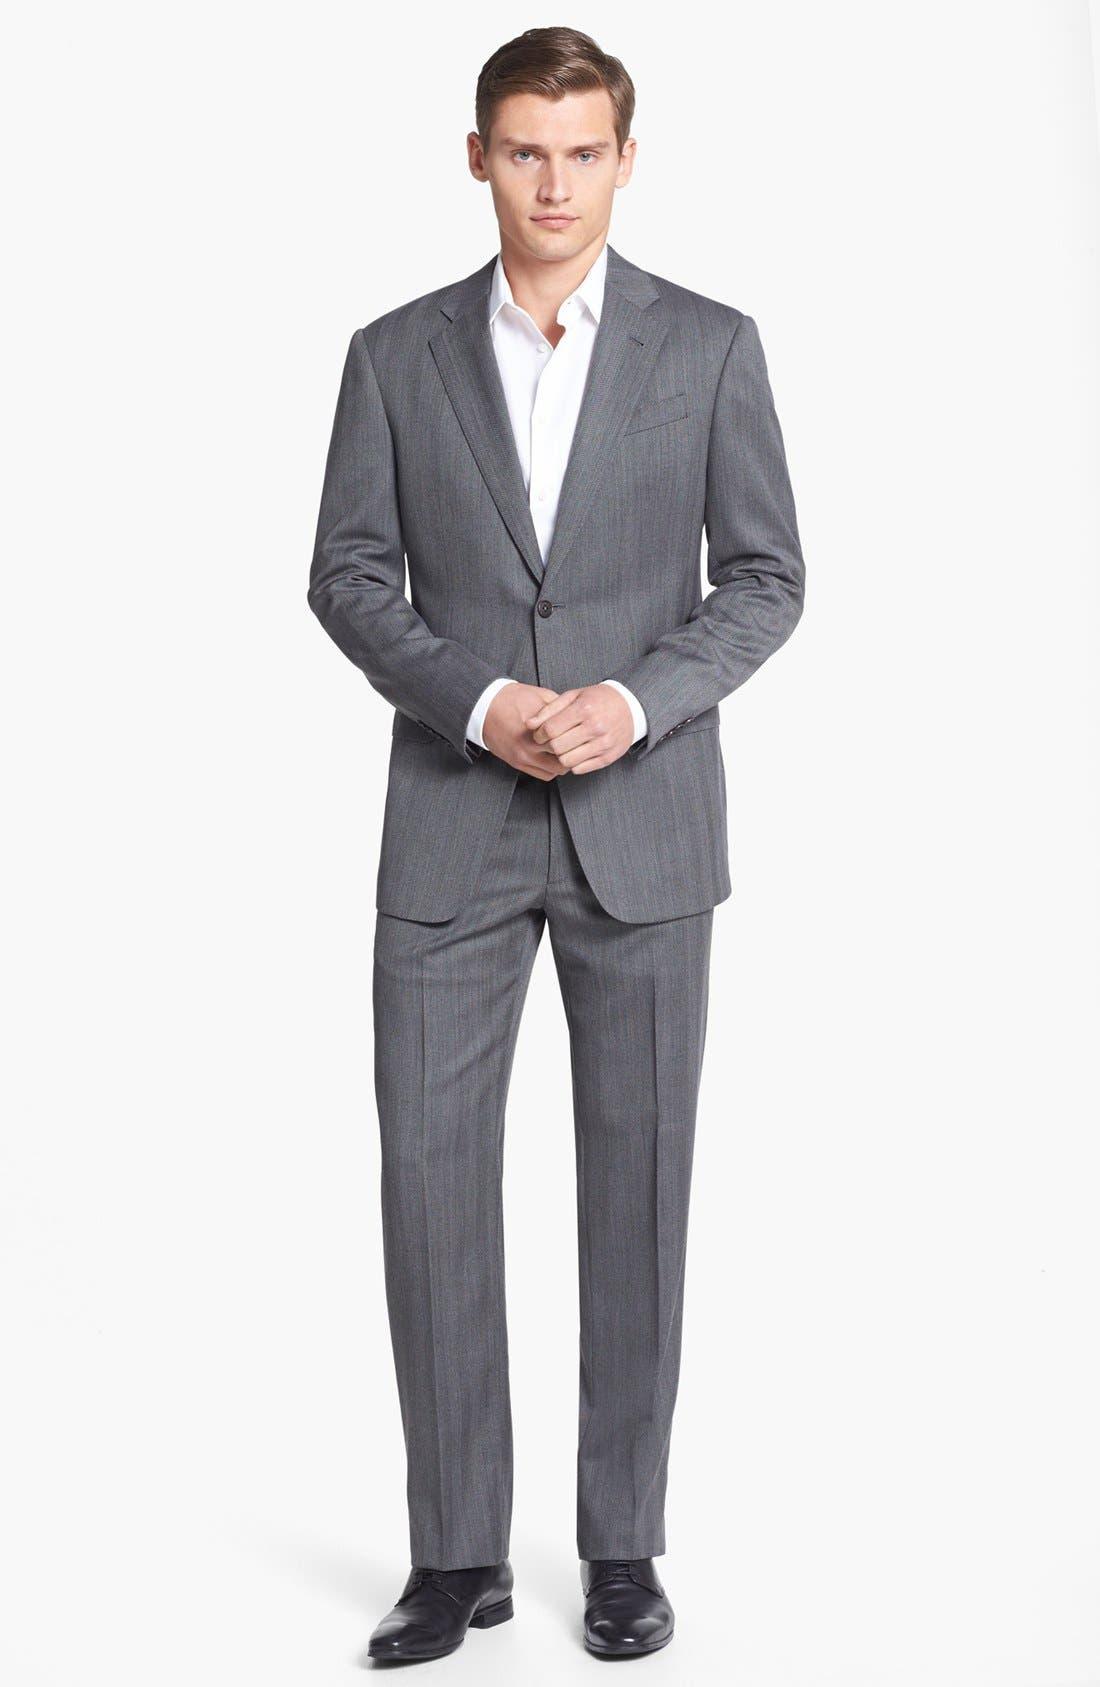 Alternate Image 1 Selected - Armani Collezioni 'Giorgio' Grey Herringbone Wool Suit